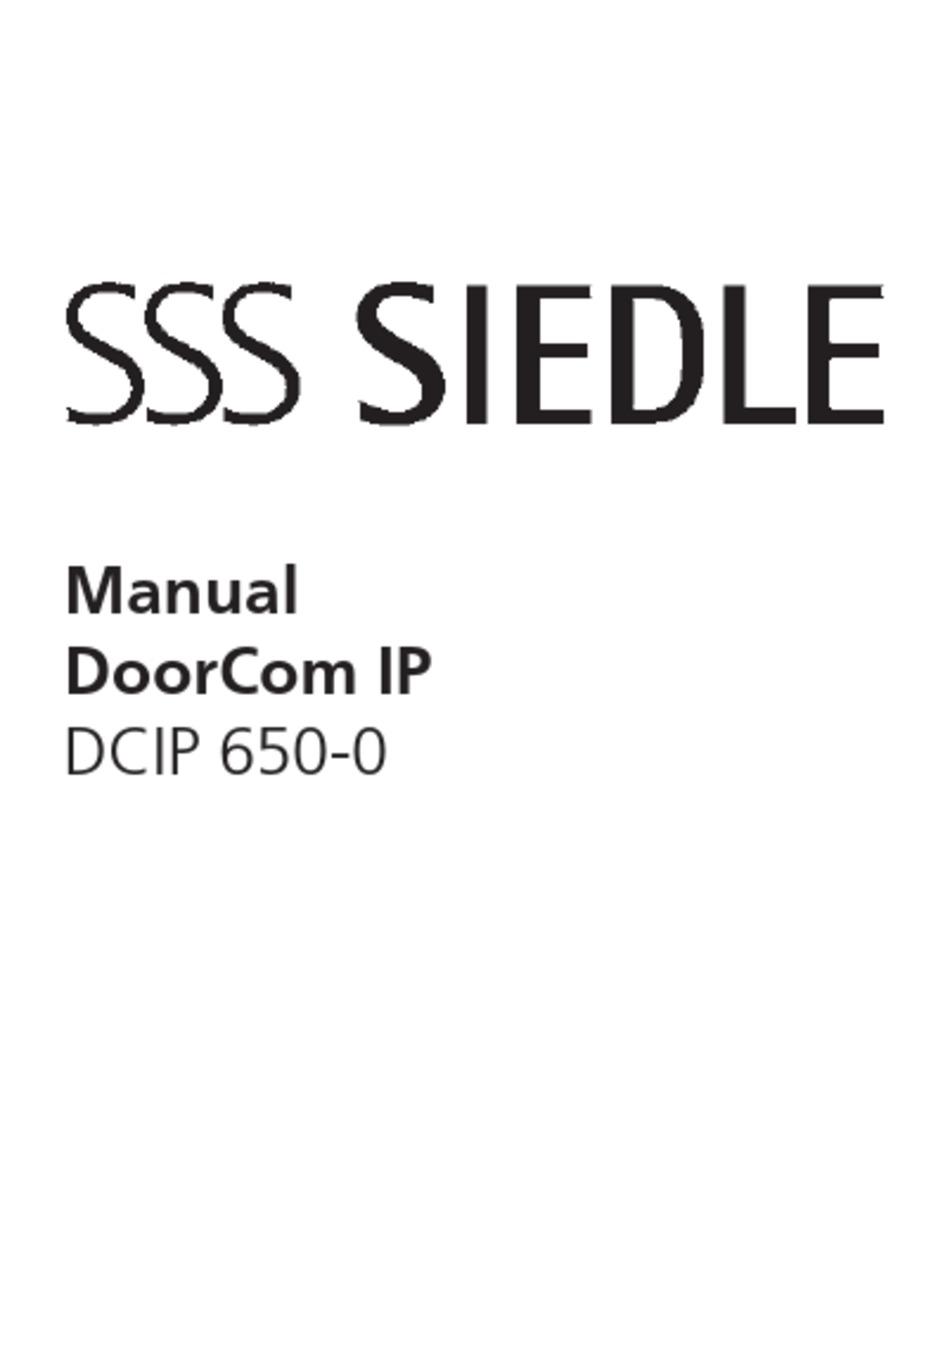 SSS SIEDLE DOORCOM IP DCIP 650-0 MANUAL Pdf Download